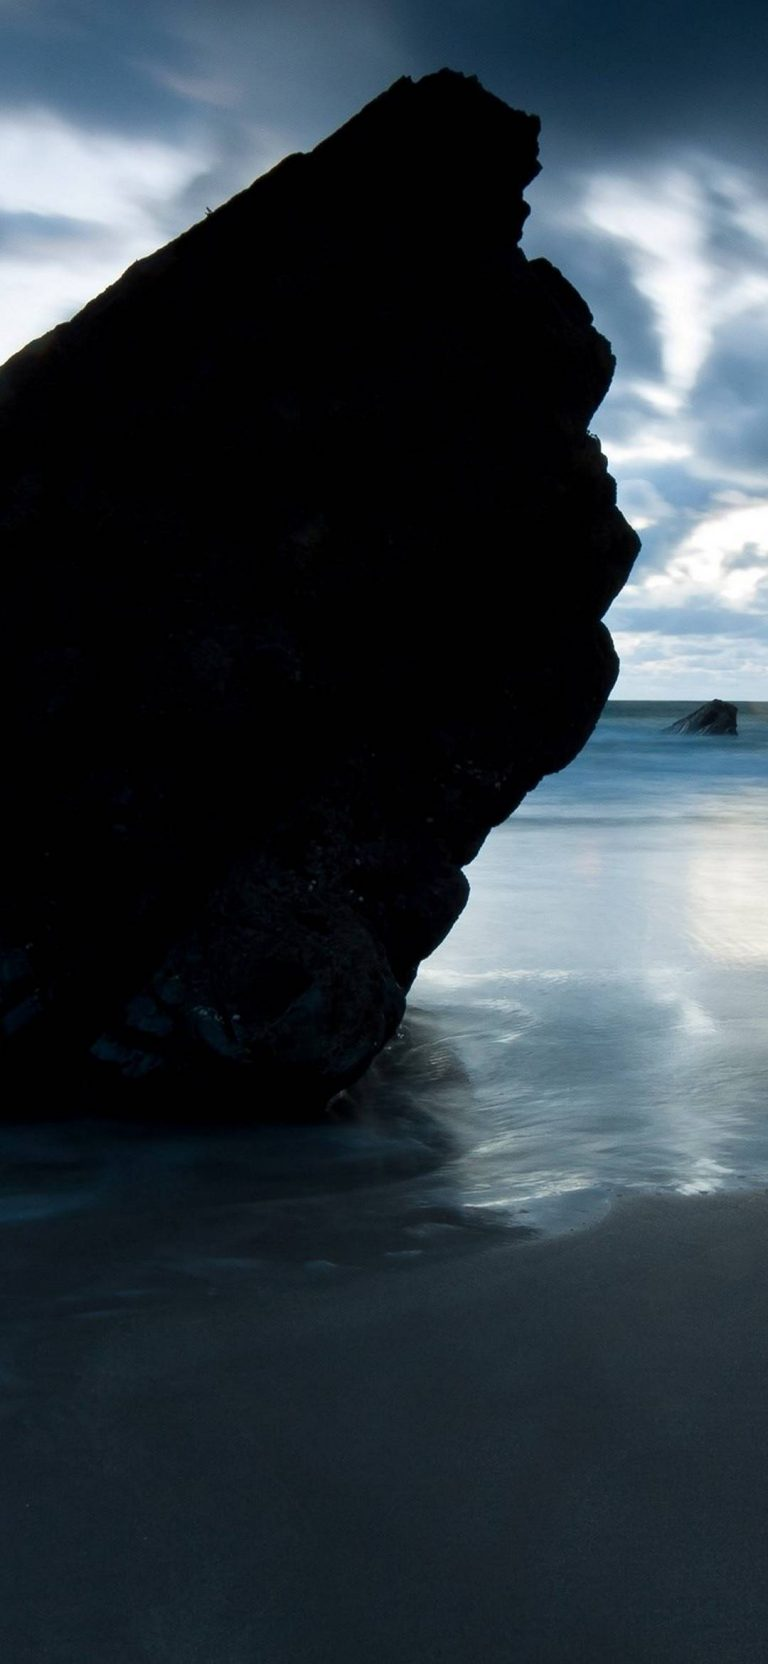 Nature Landscape Ocean Sea Beach 1080x2340 768x1664